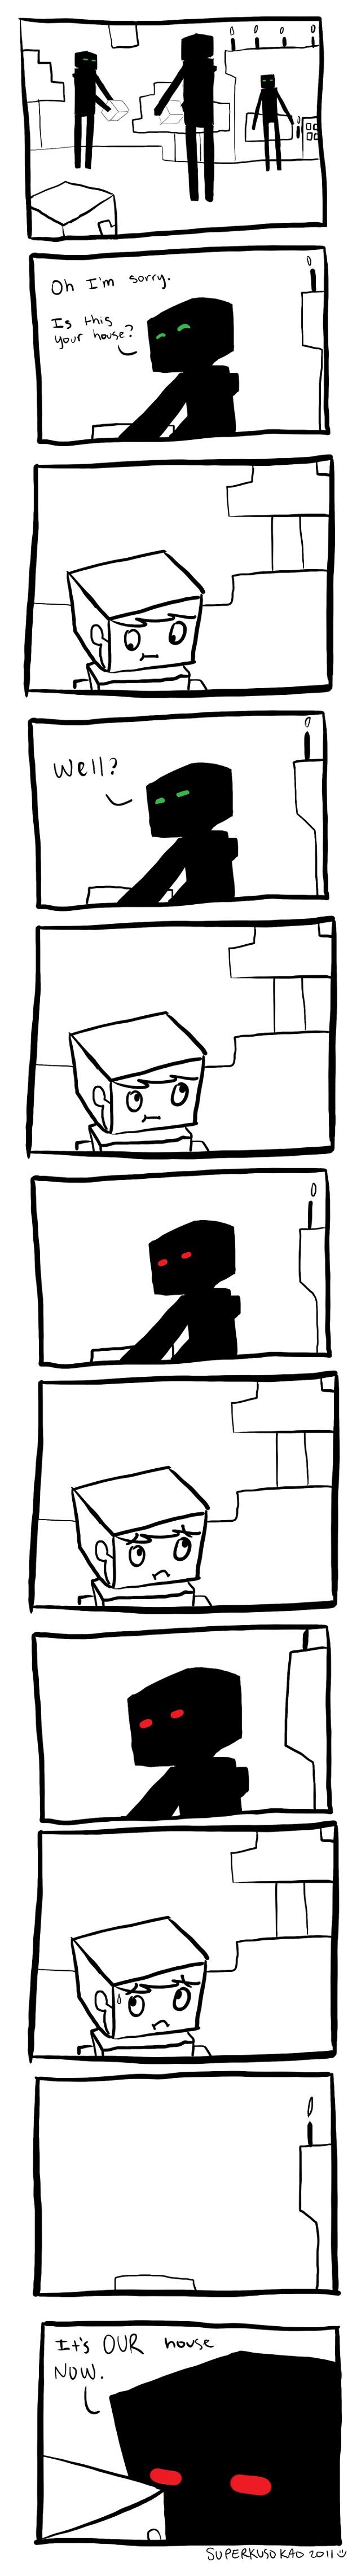 http://img.niceminecraft.net/Funny/Minecraft-comic-15.jpg